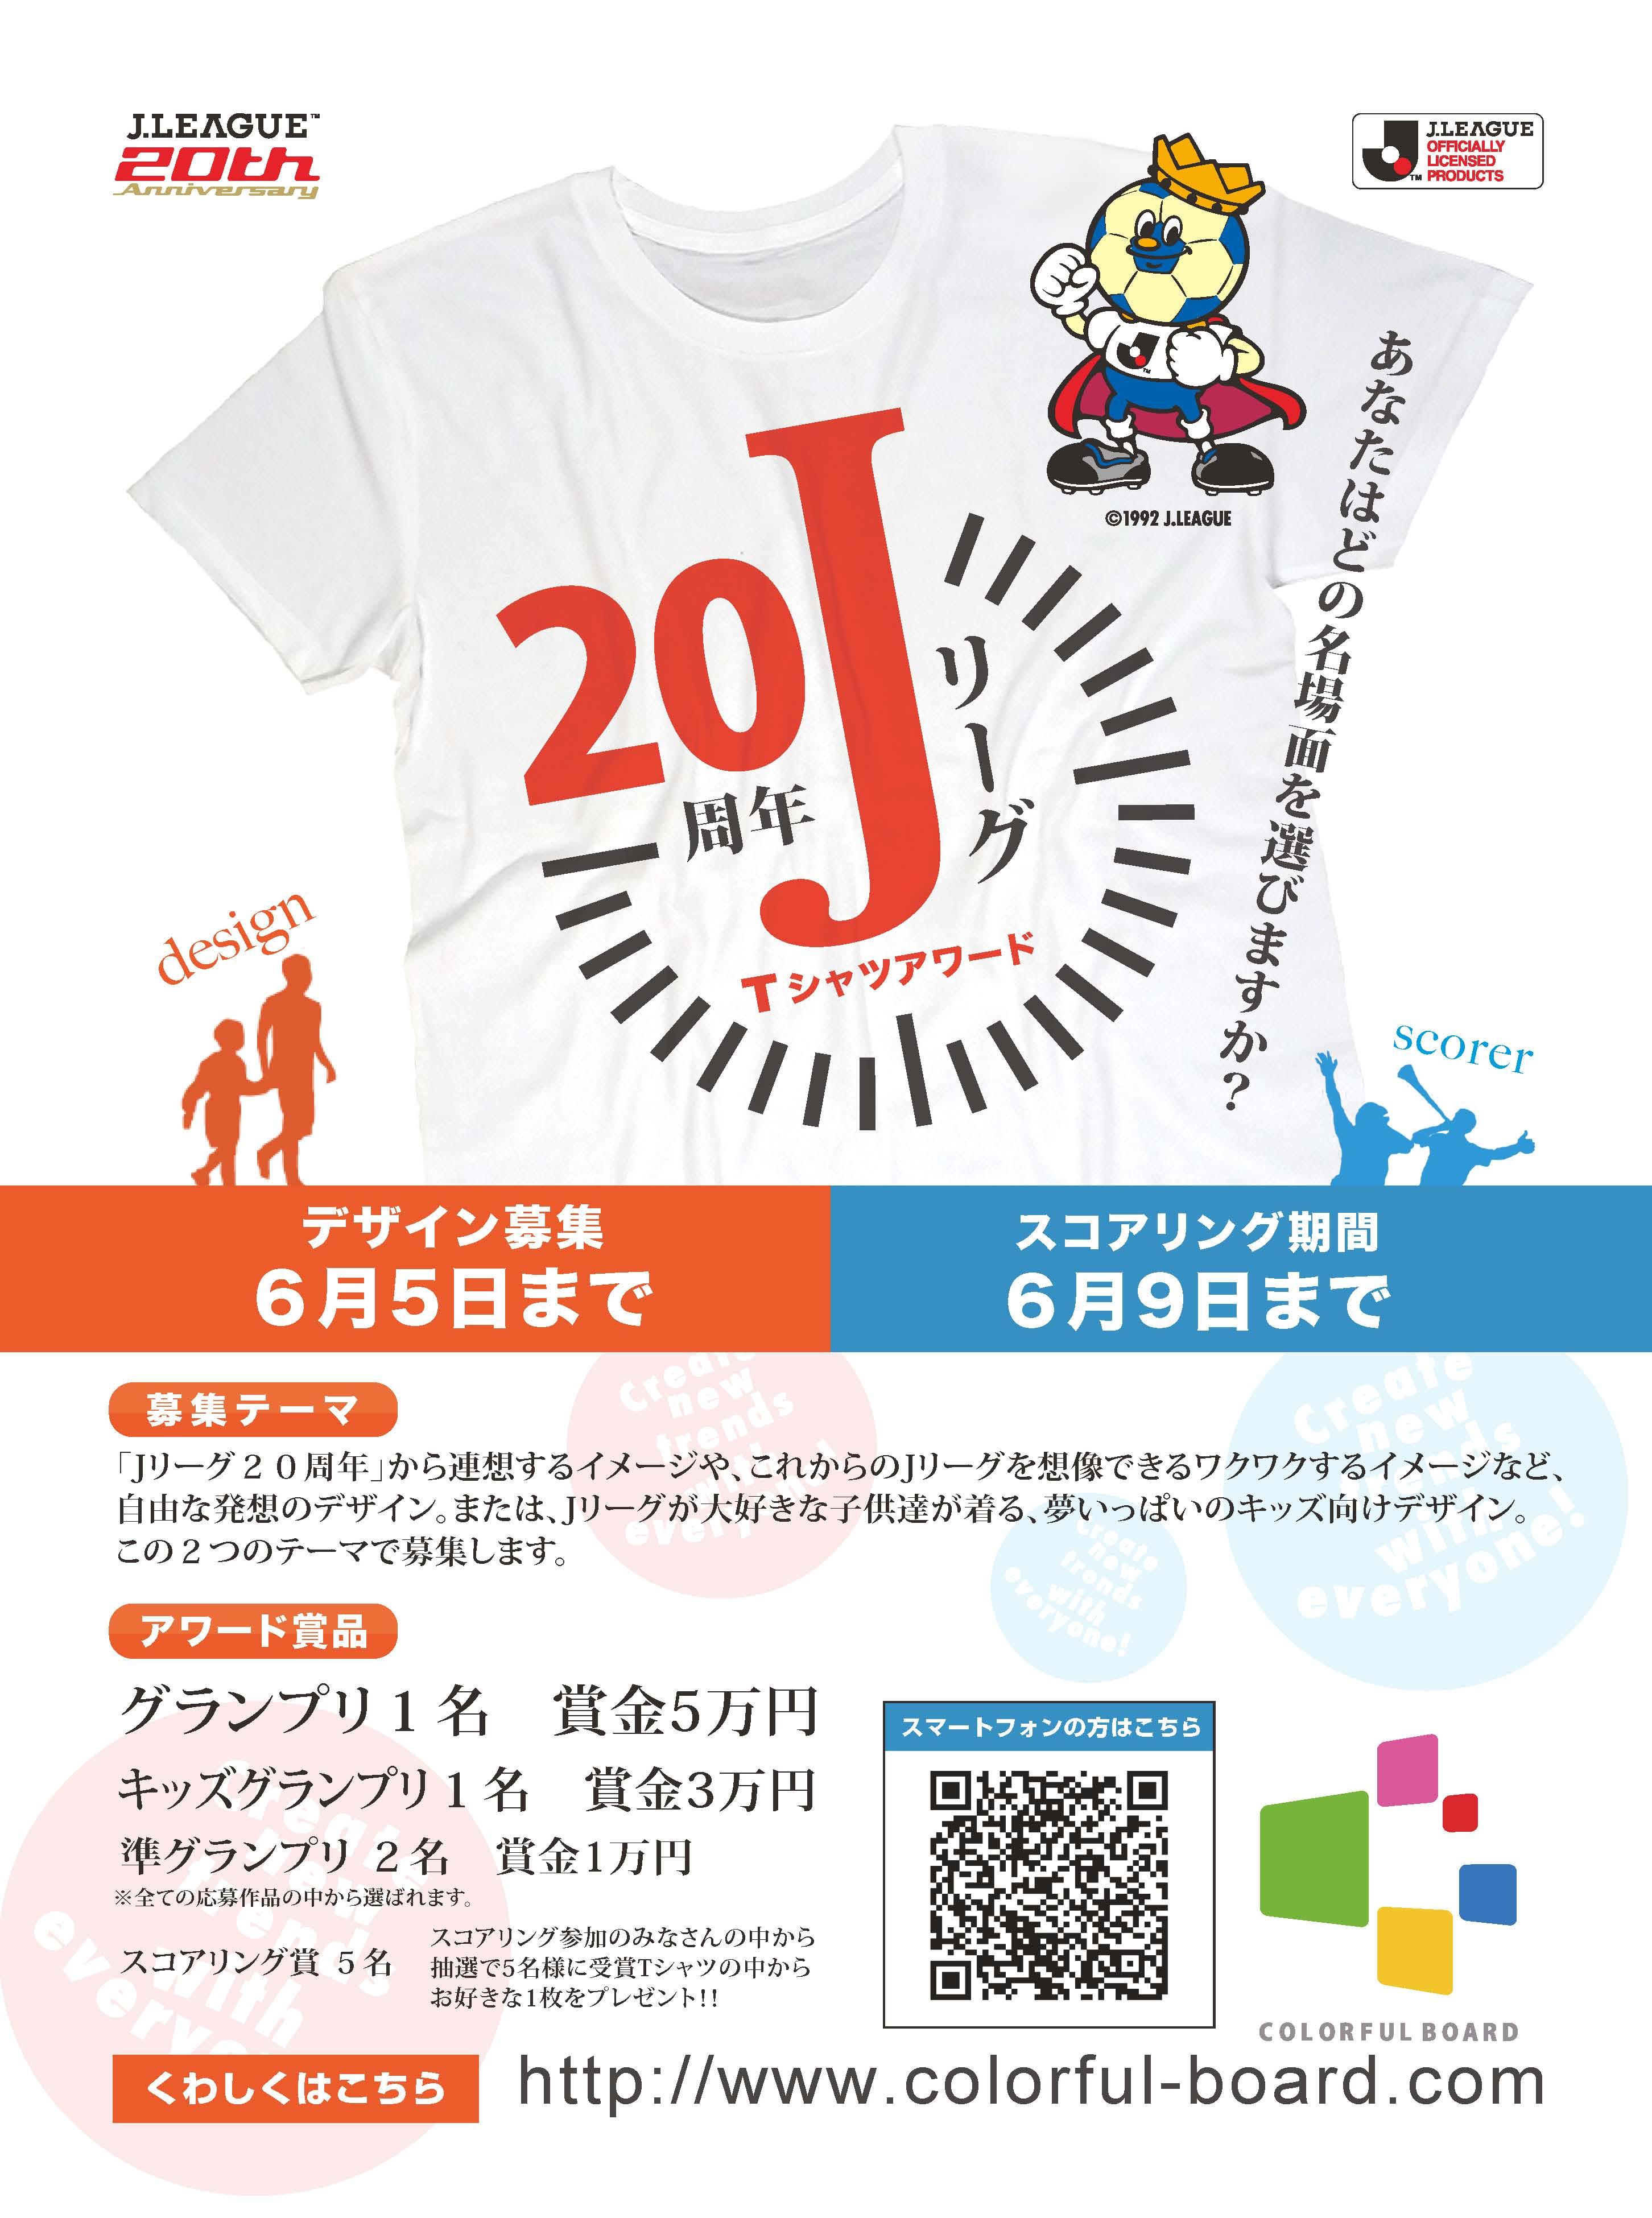 「Jリーグ20周年オフィシャルライセンスT シャツアワード」が「COLORFUL BOARD」上で開催!